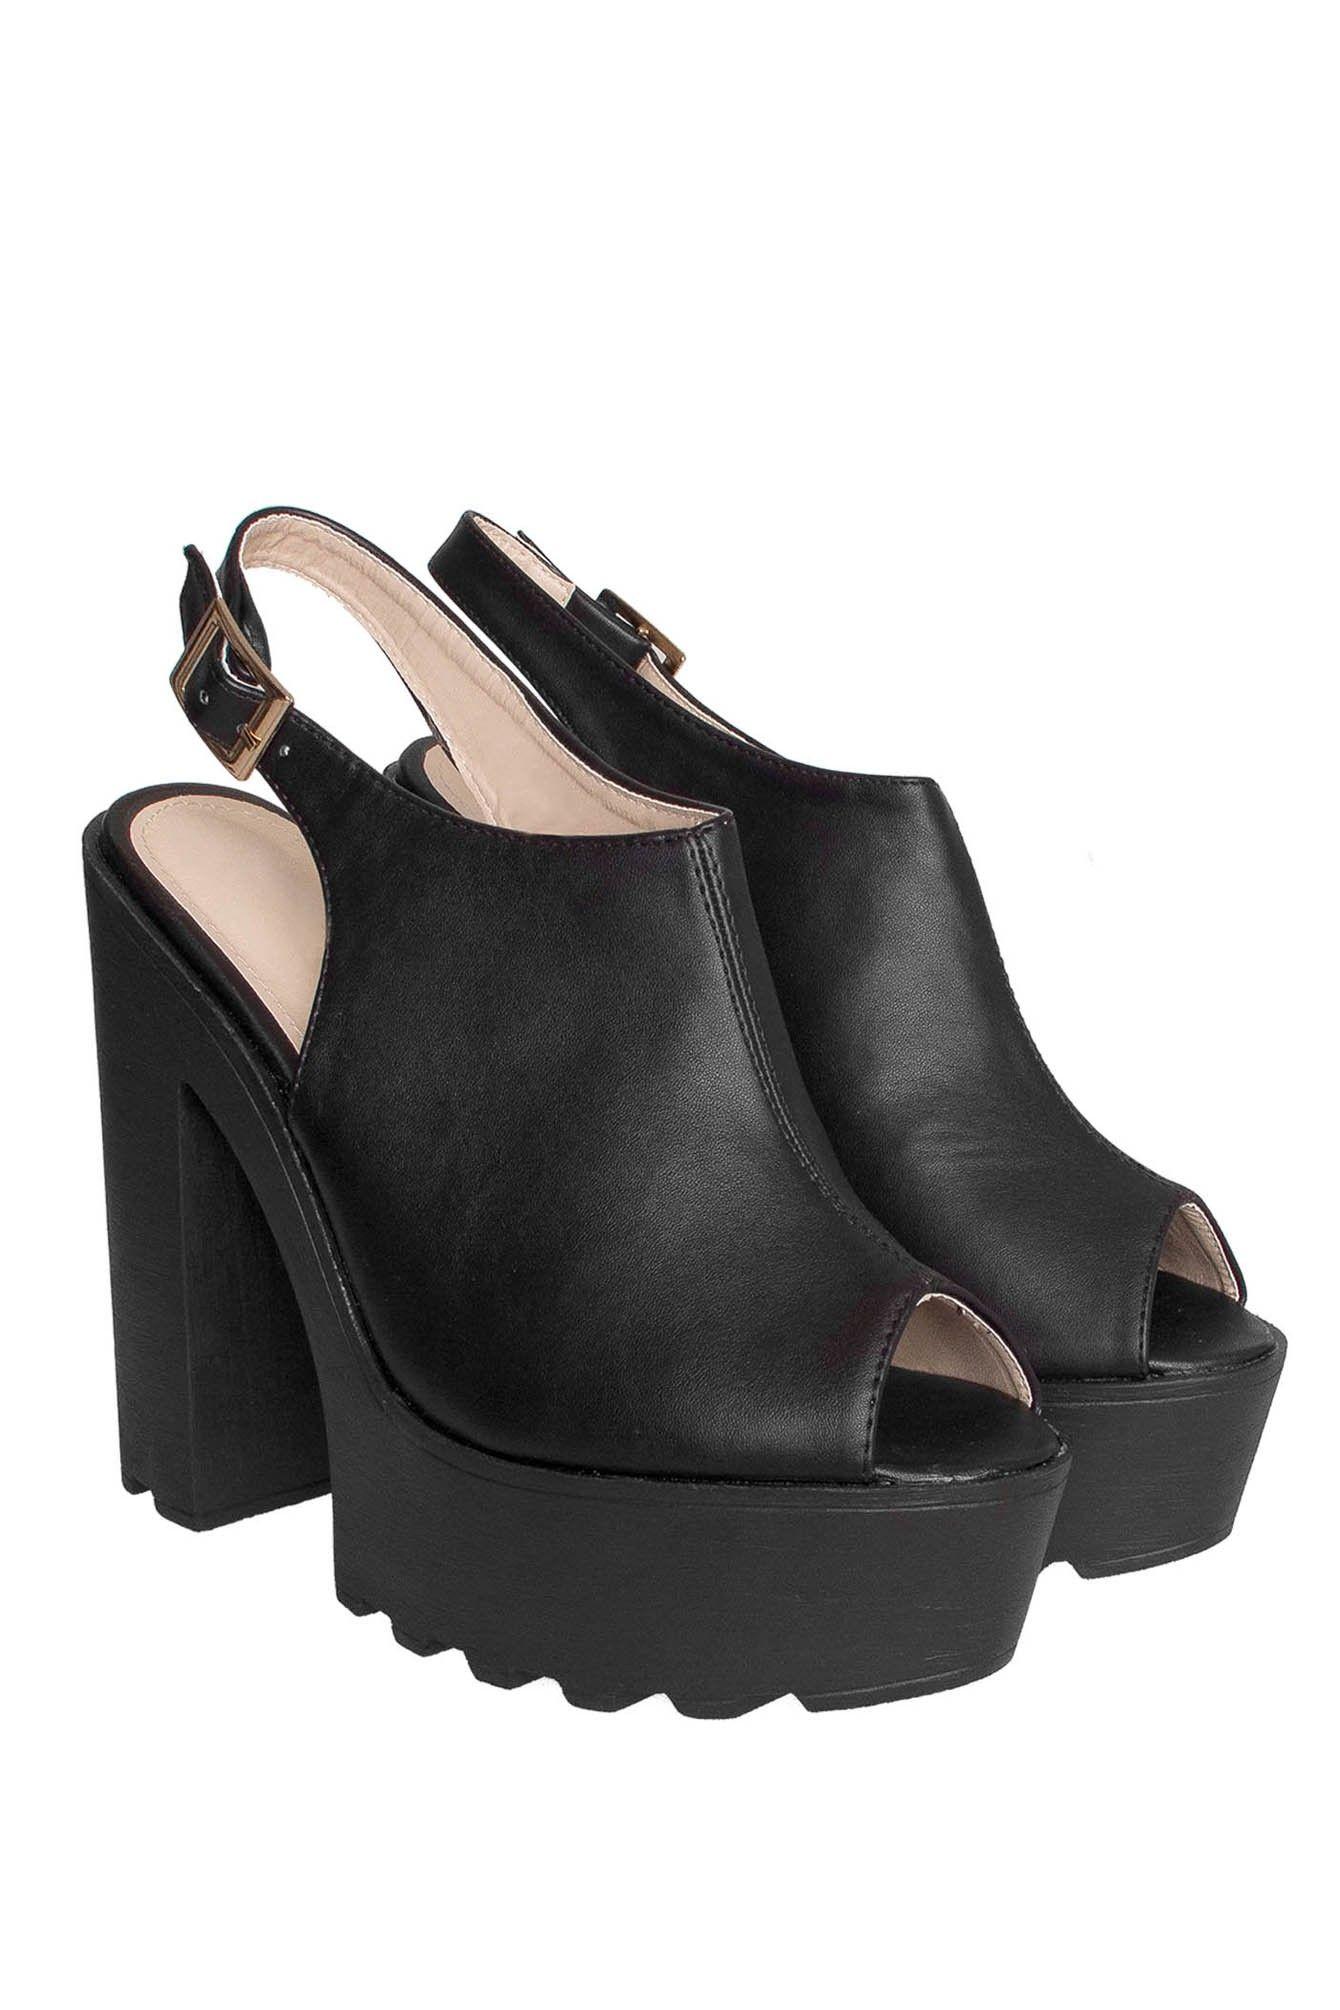 Botines punta abierta negro Keneth - Shoes - Sale